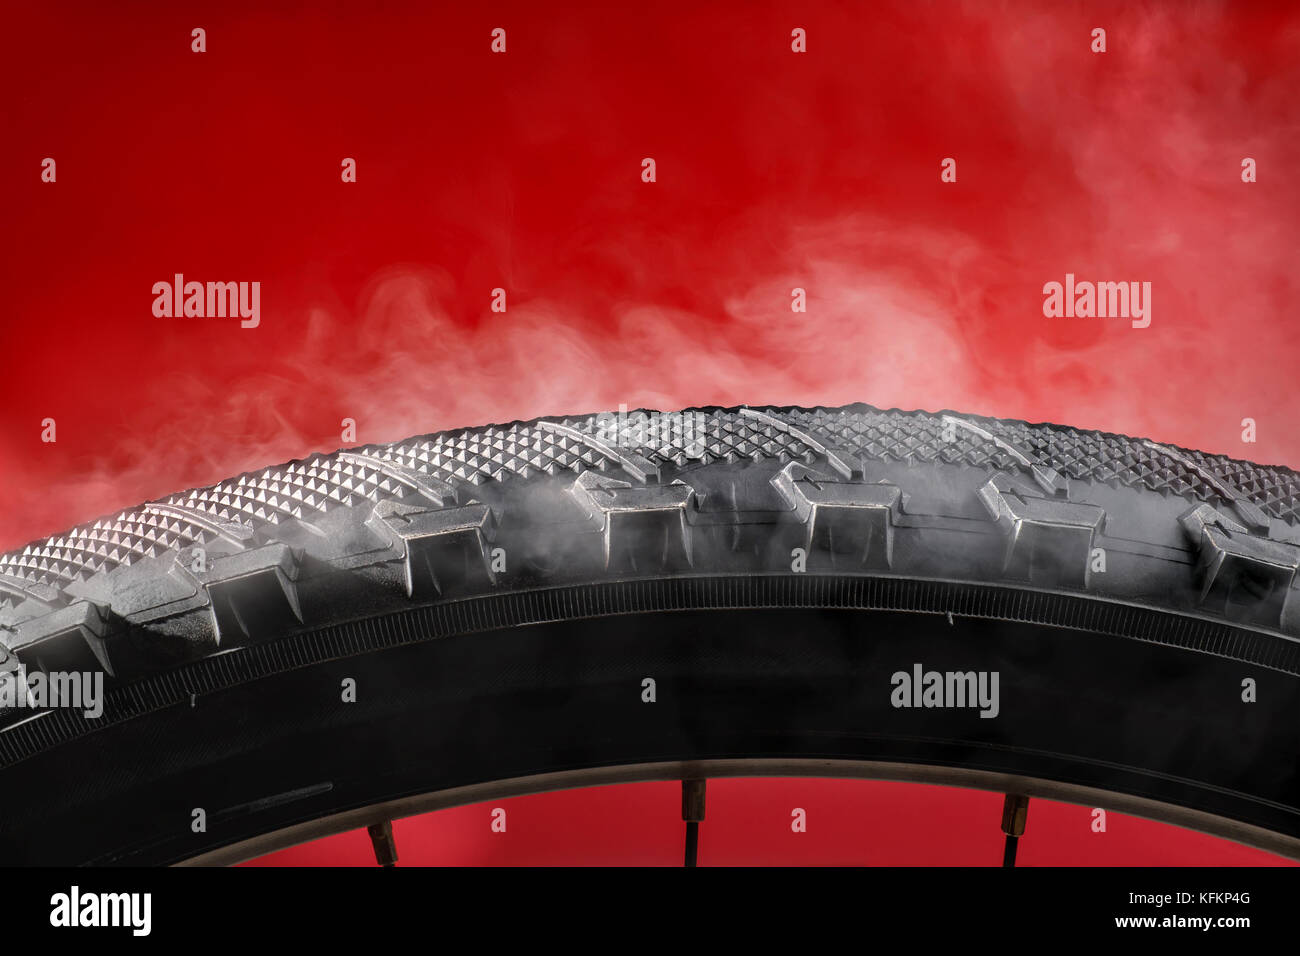 Smoking bike tire. On red background - Stock Image